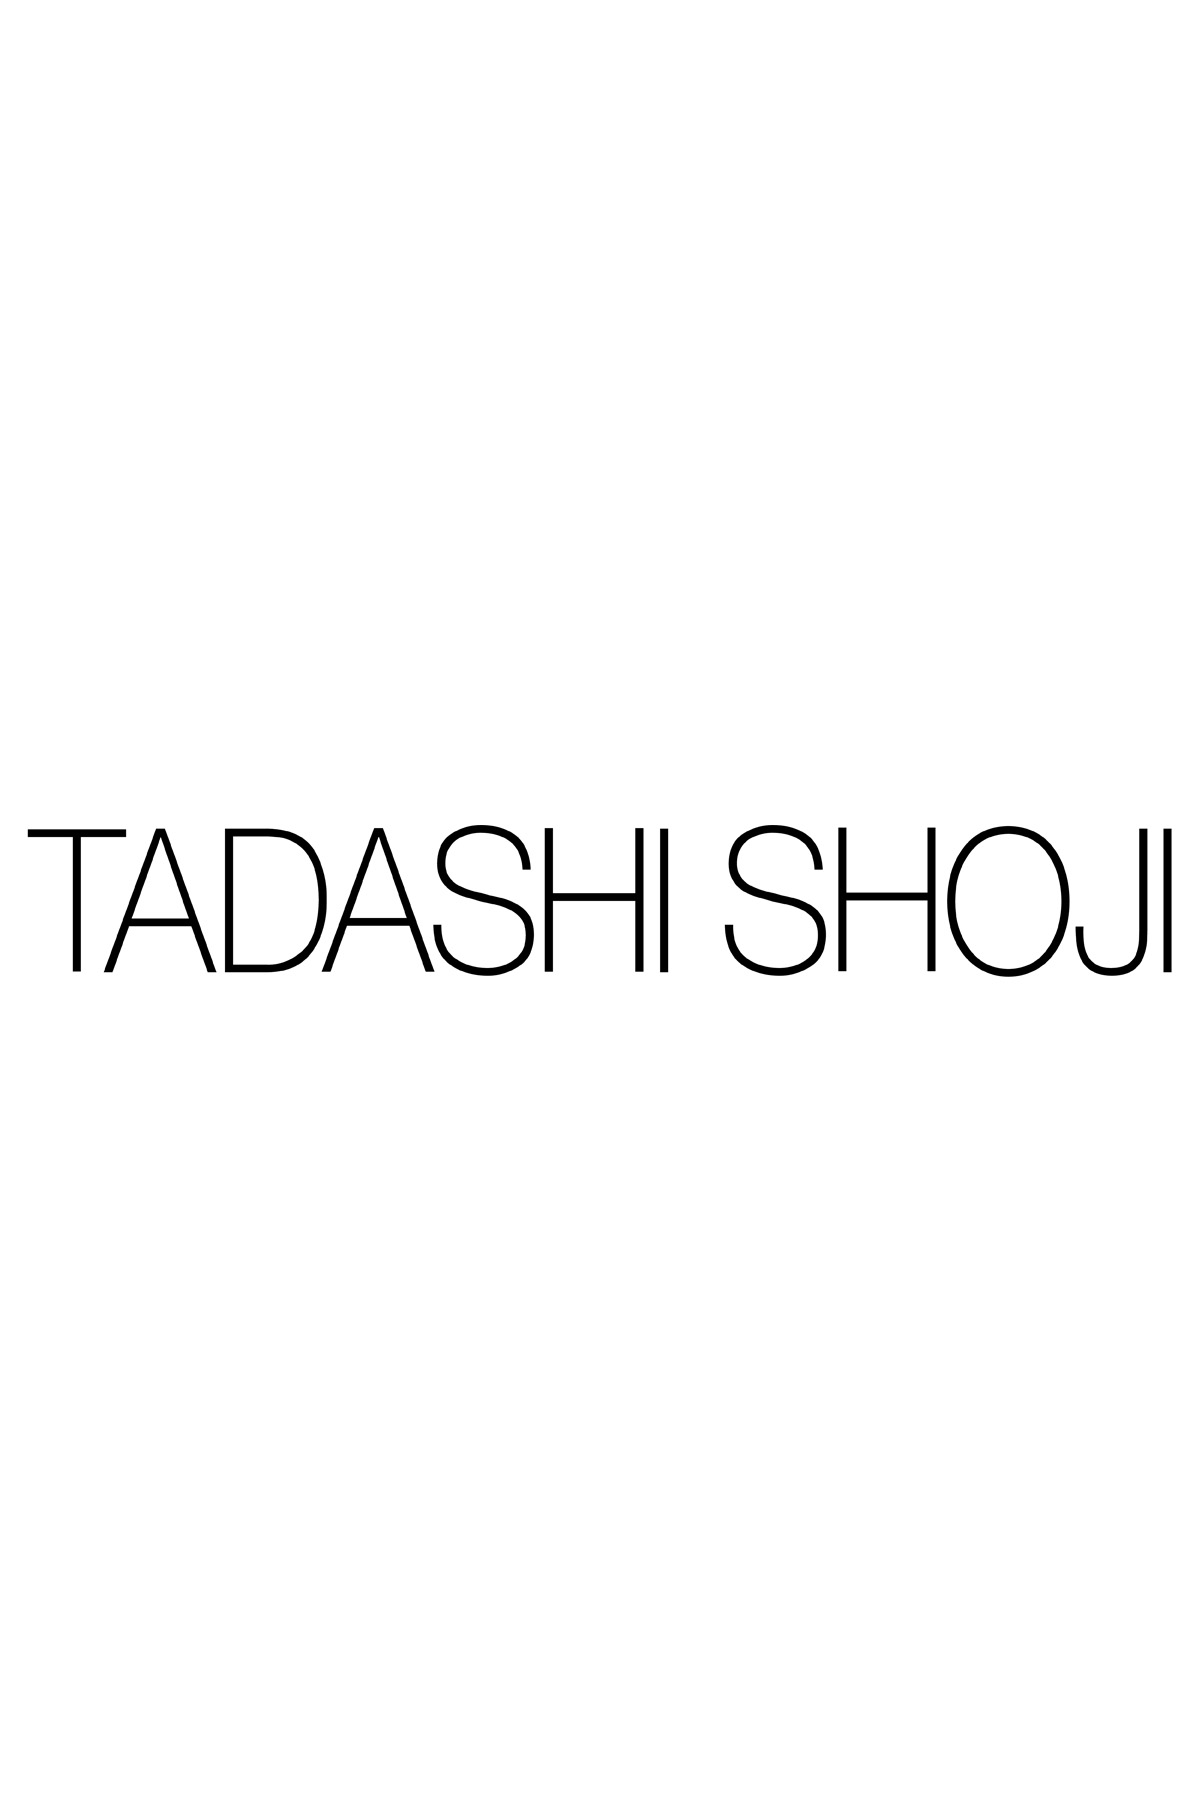 Tadashi Shoji - Corded Embroidery on Tulle Boatneck Dress